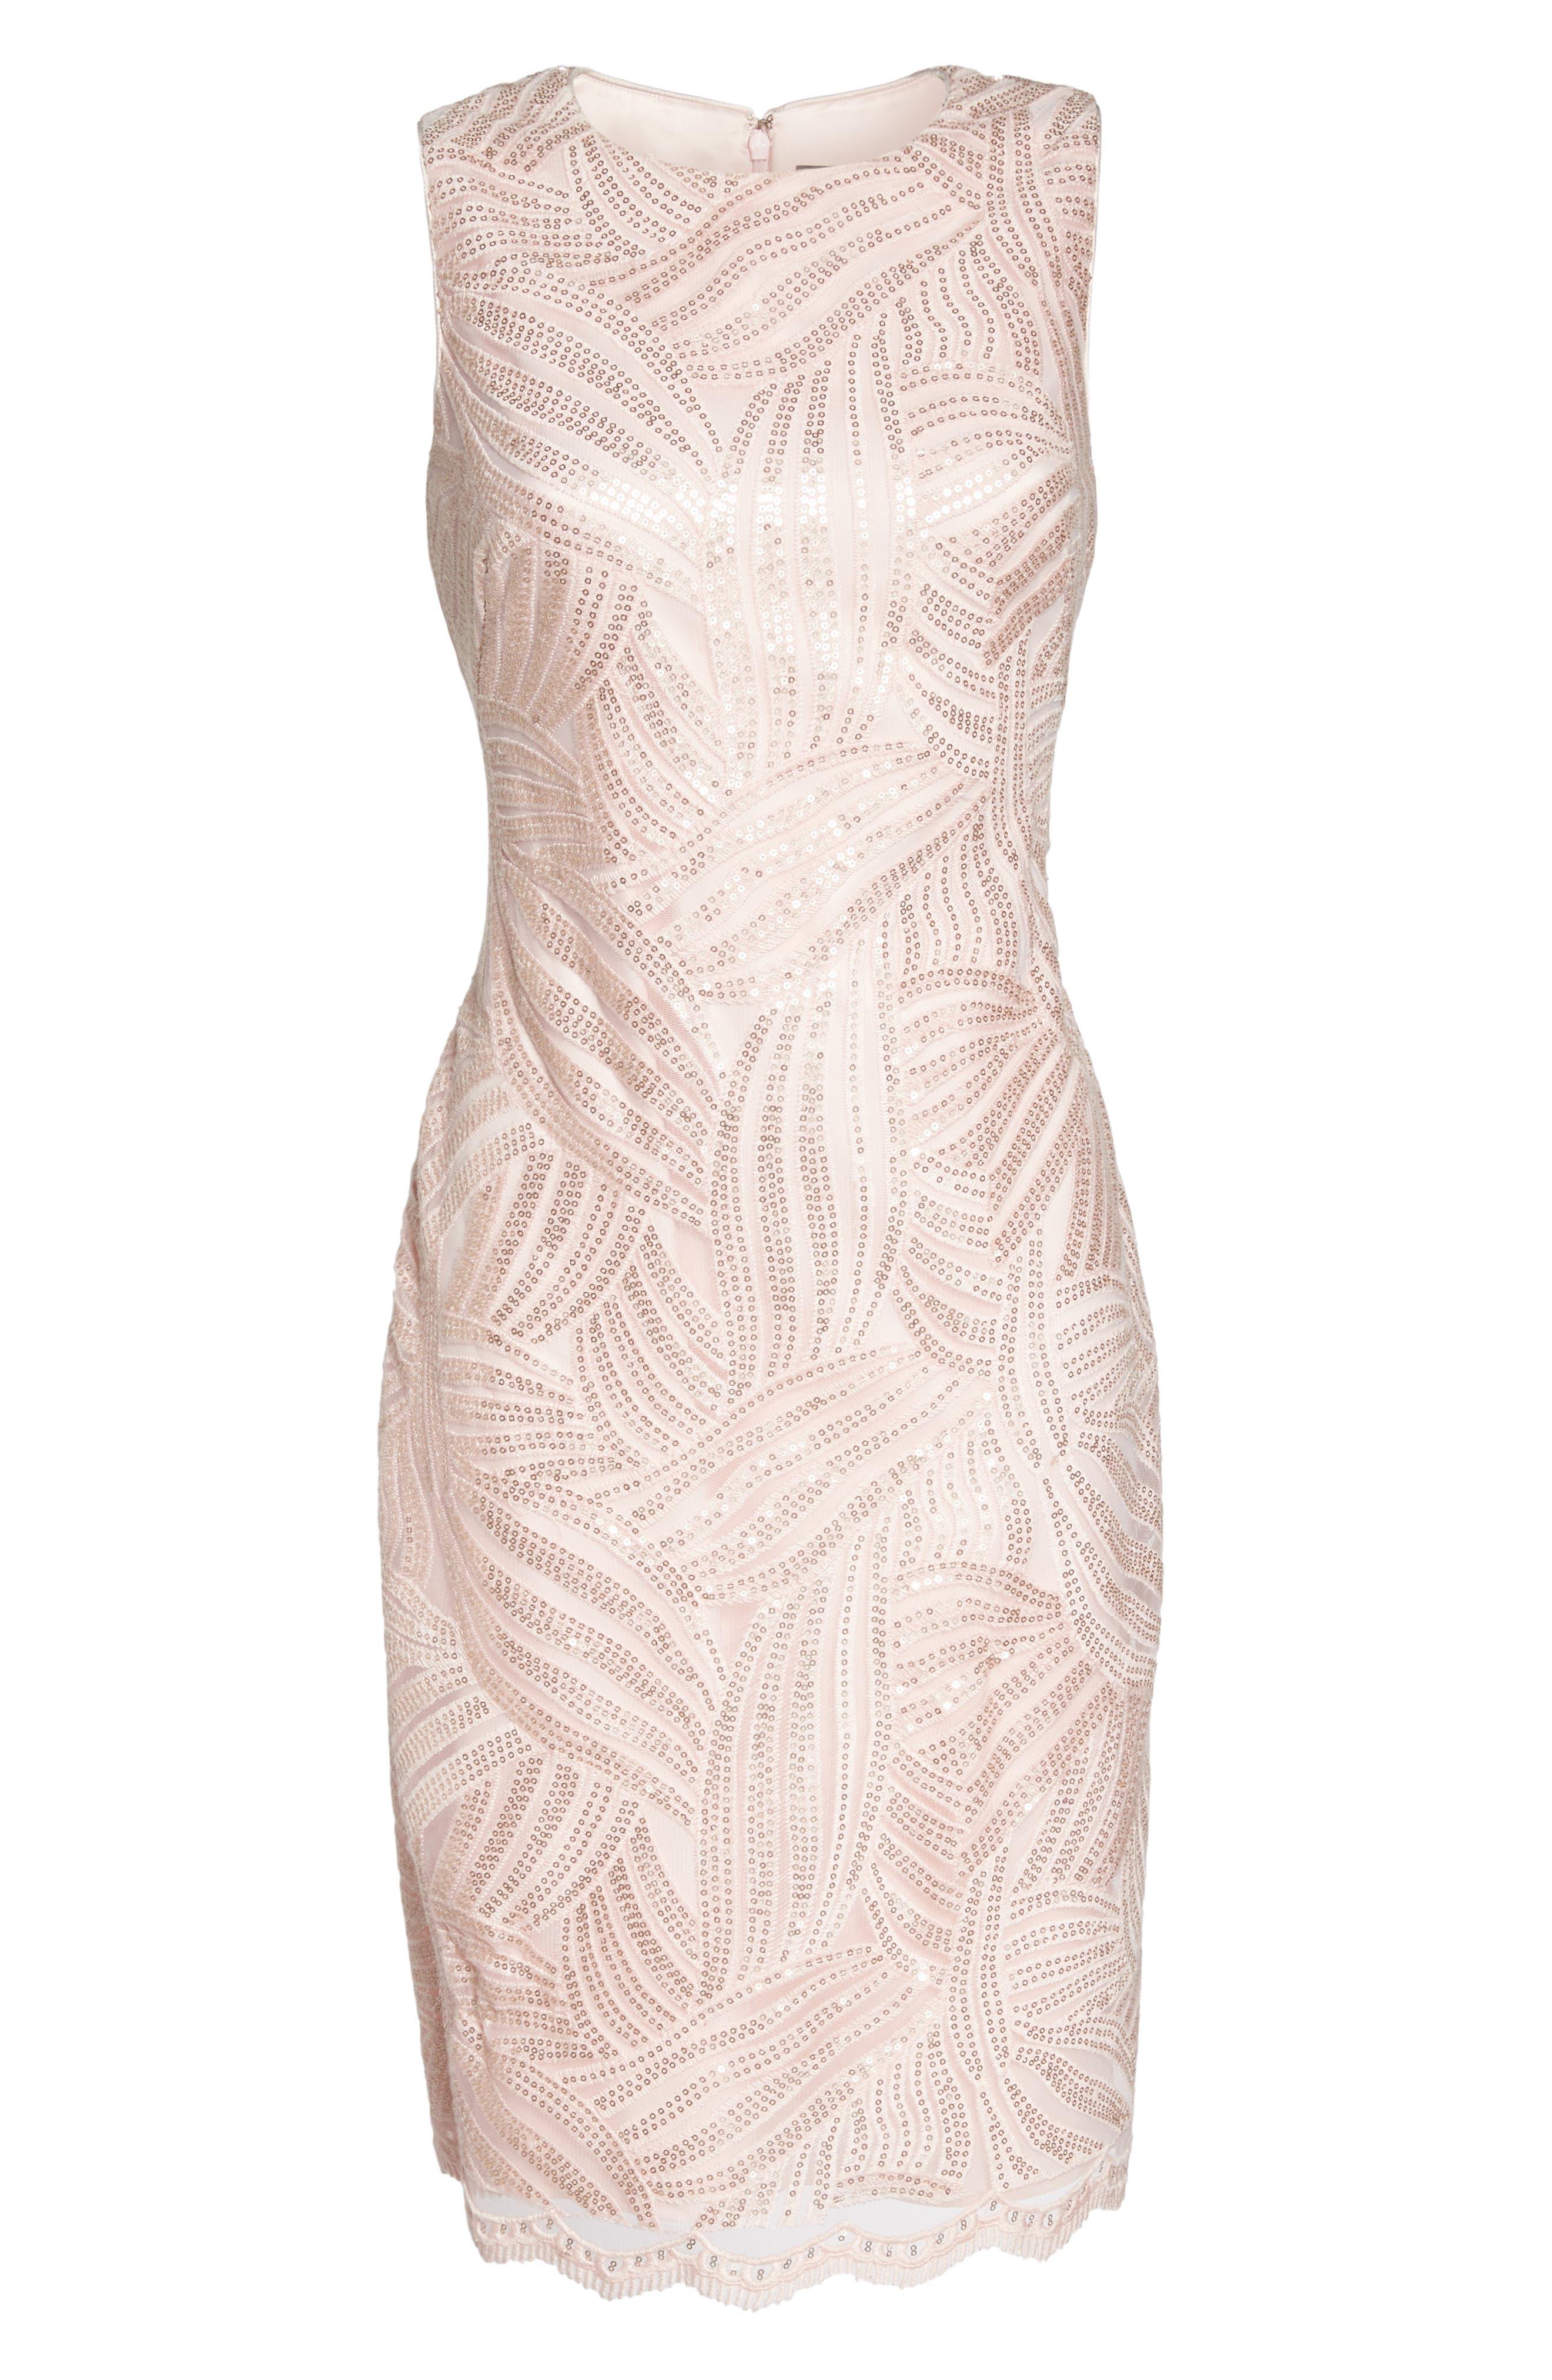 Sleeveless Sequin Sheath Dress,                             Alternate thumbnail 6, color,                             680